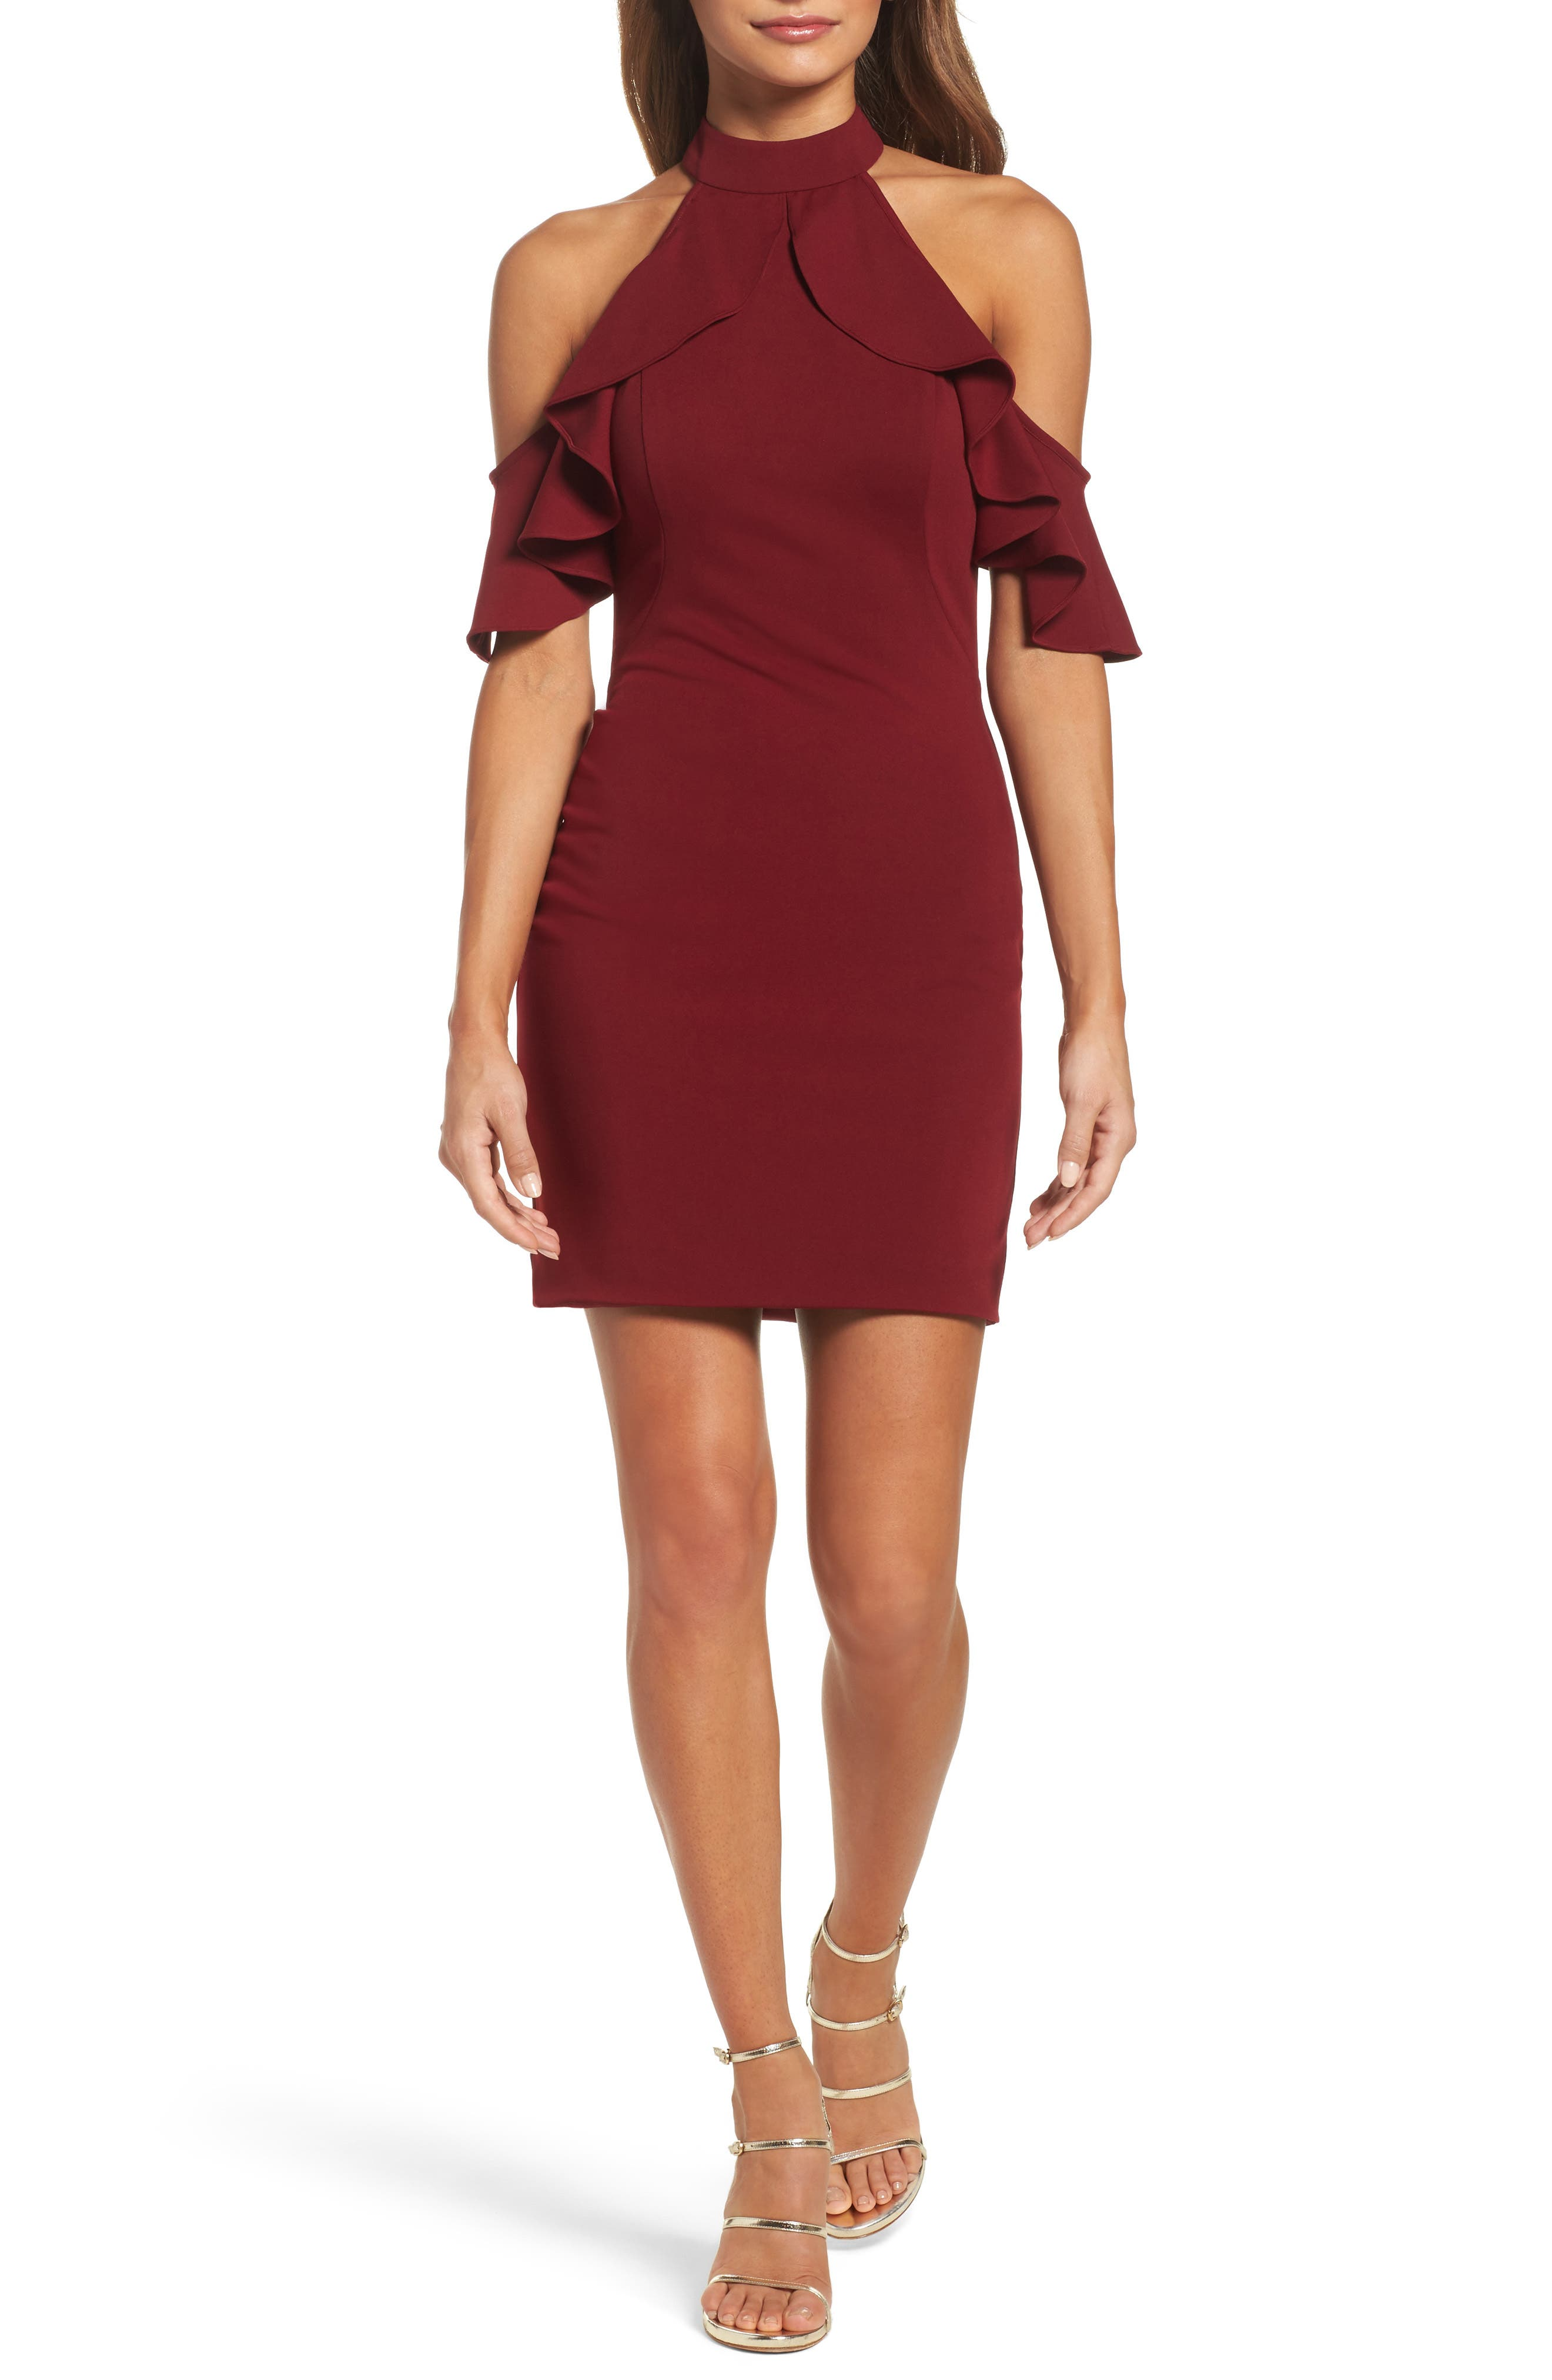 La Femme Cold Shoulder Open Back Body-Con Dress